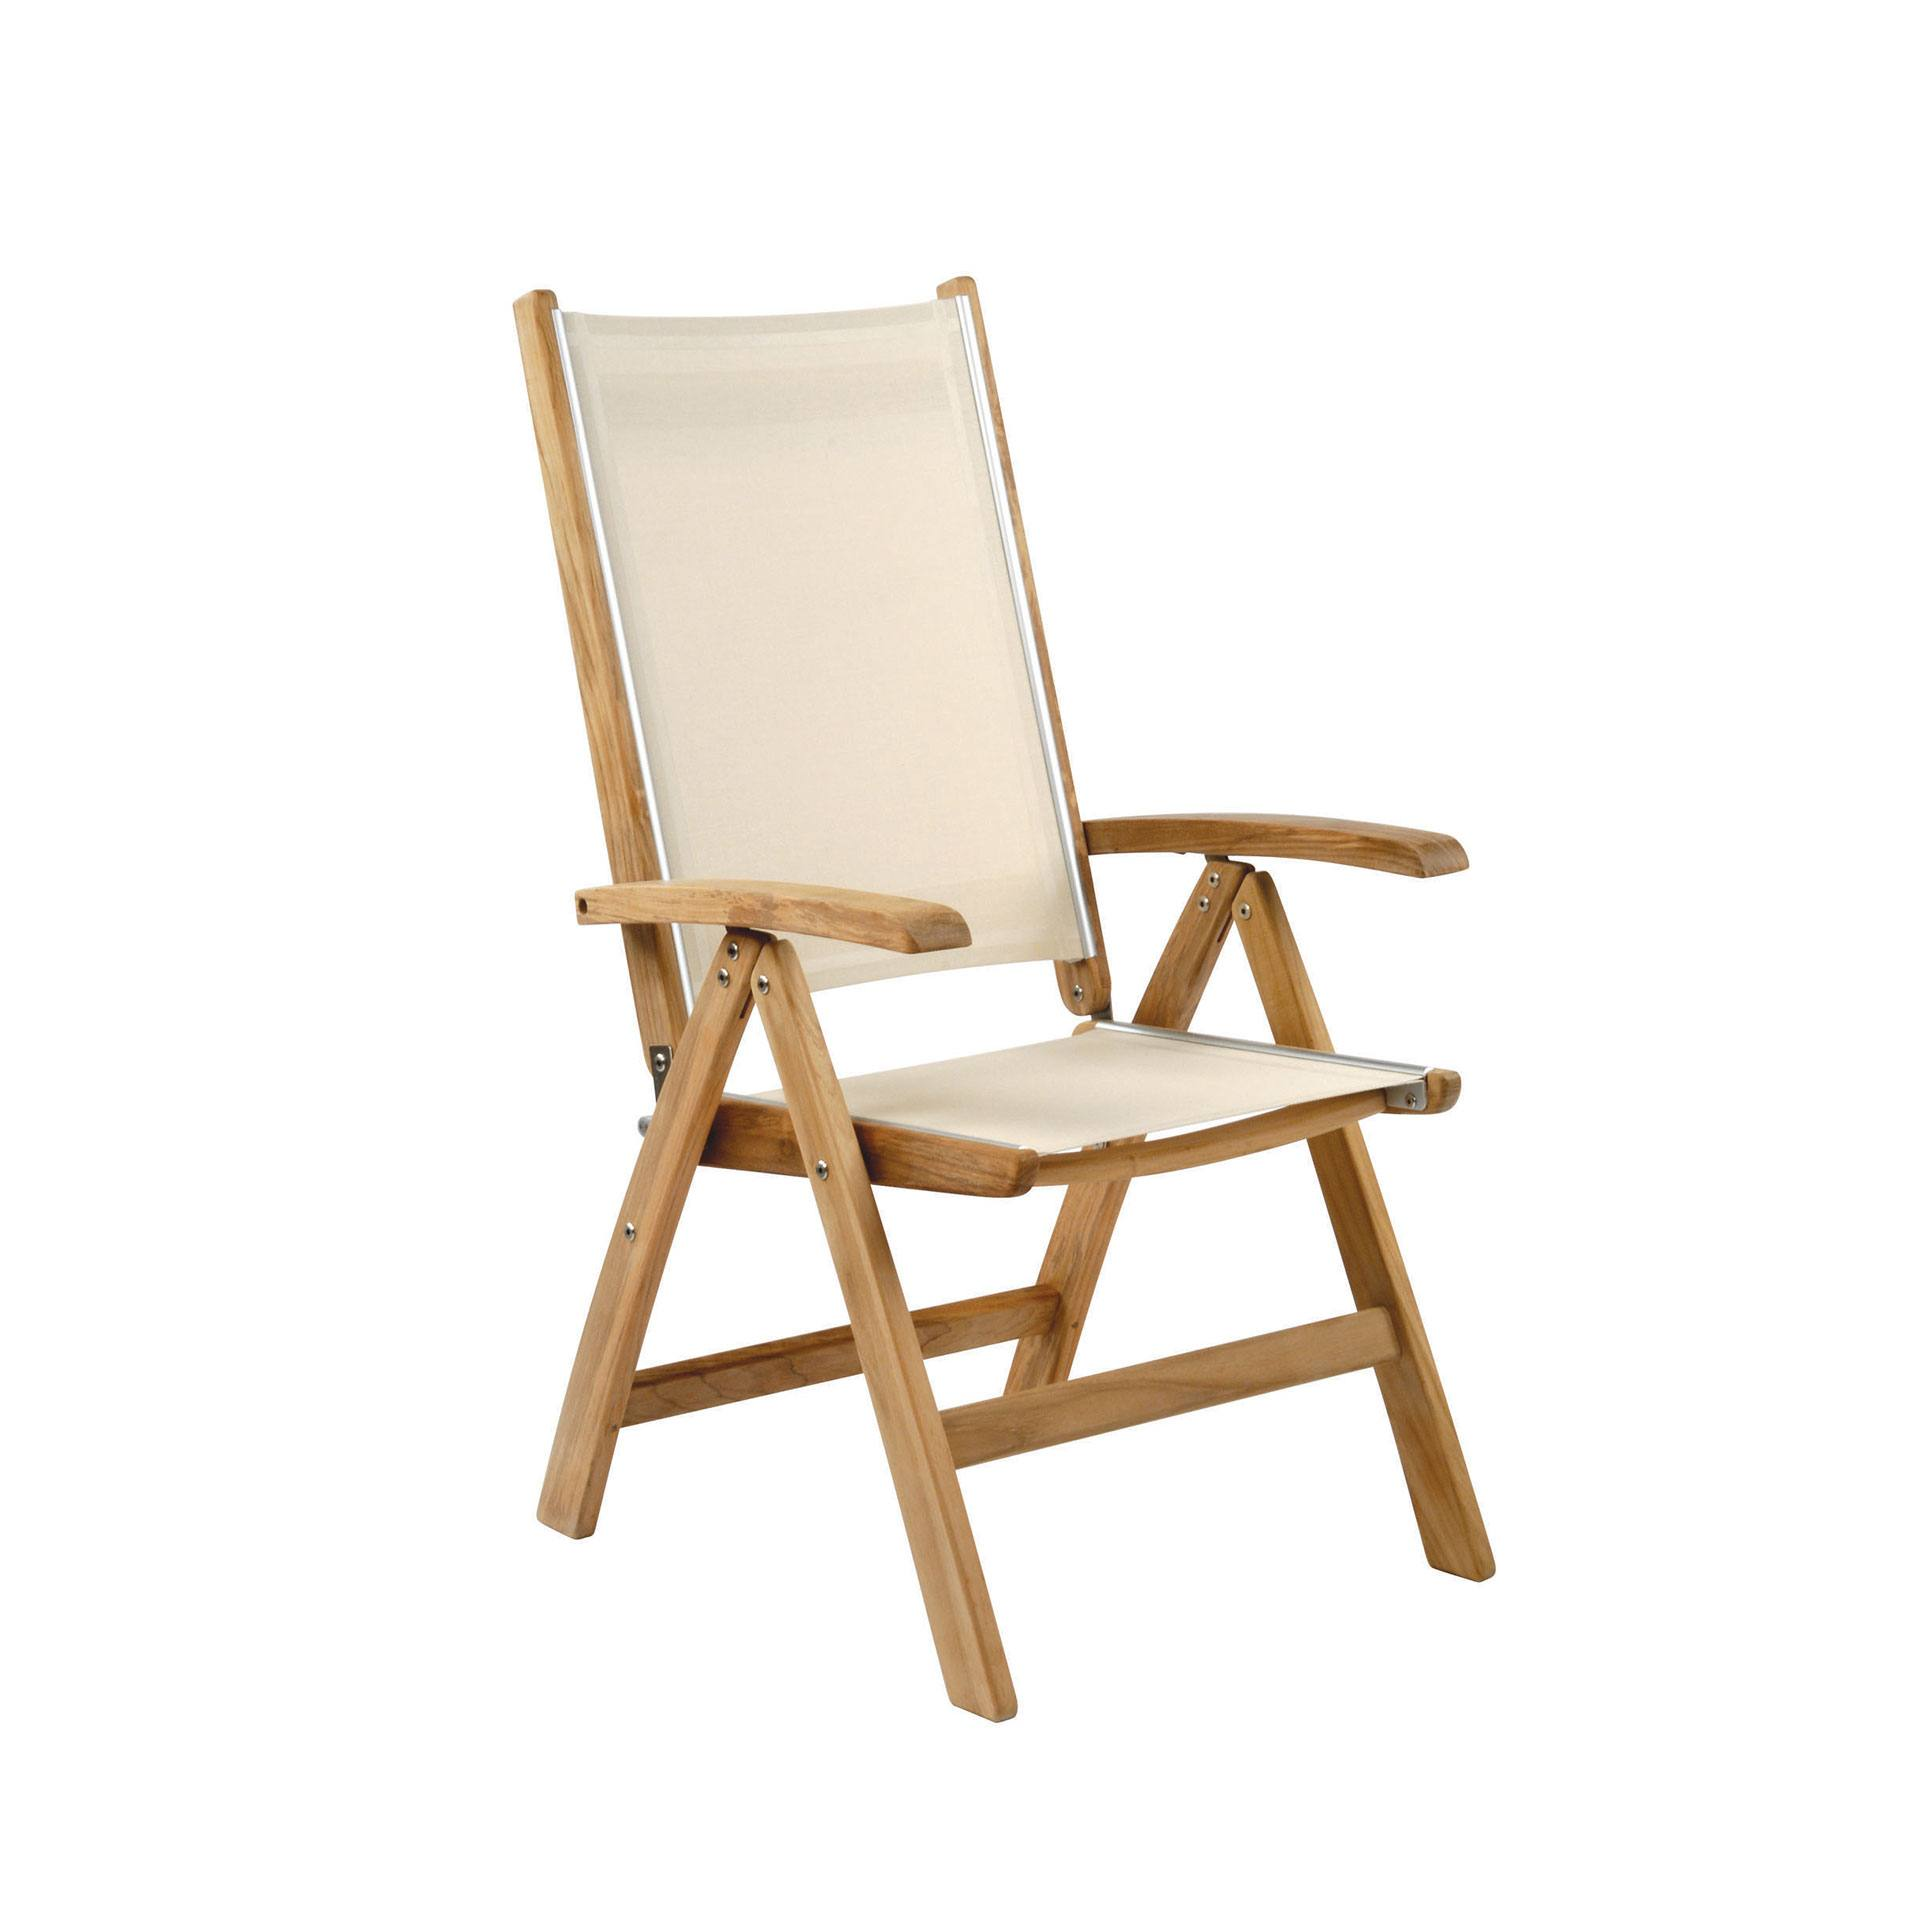 Kingsley Bate St Tropez Adjustable Chair Leisure Living